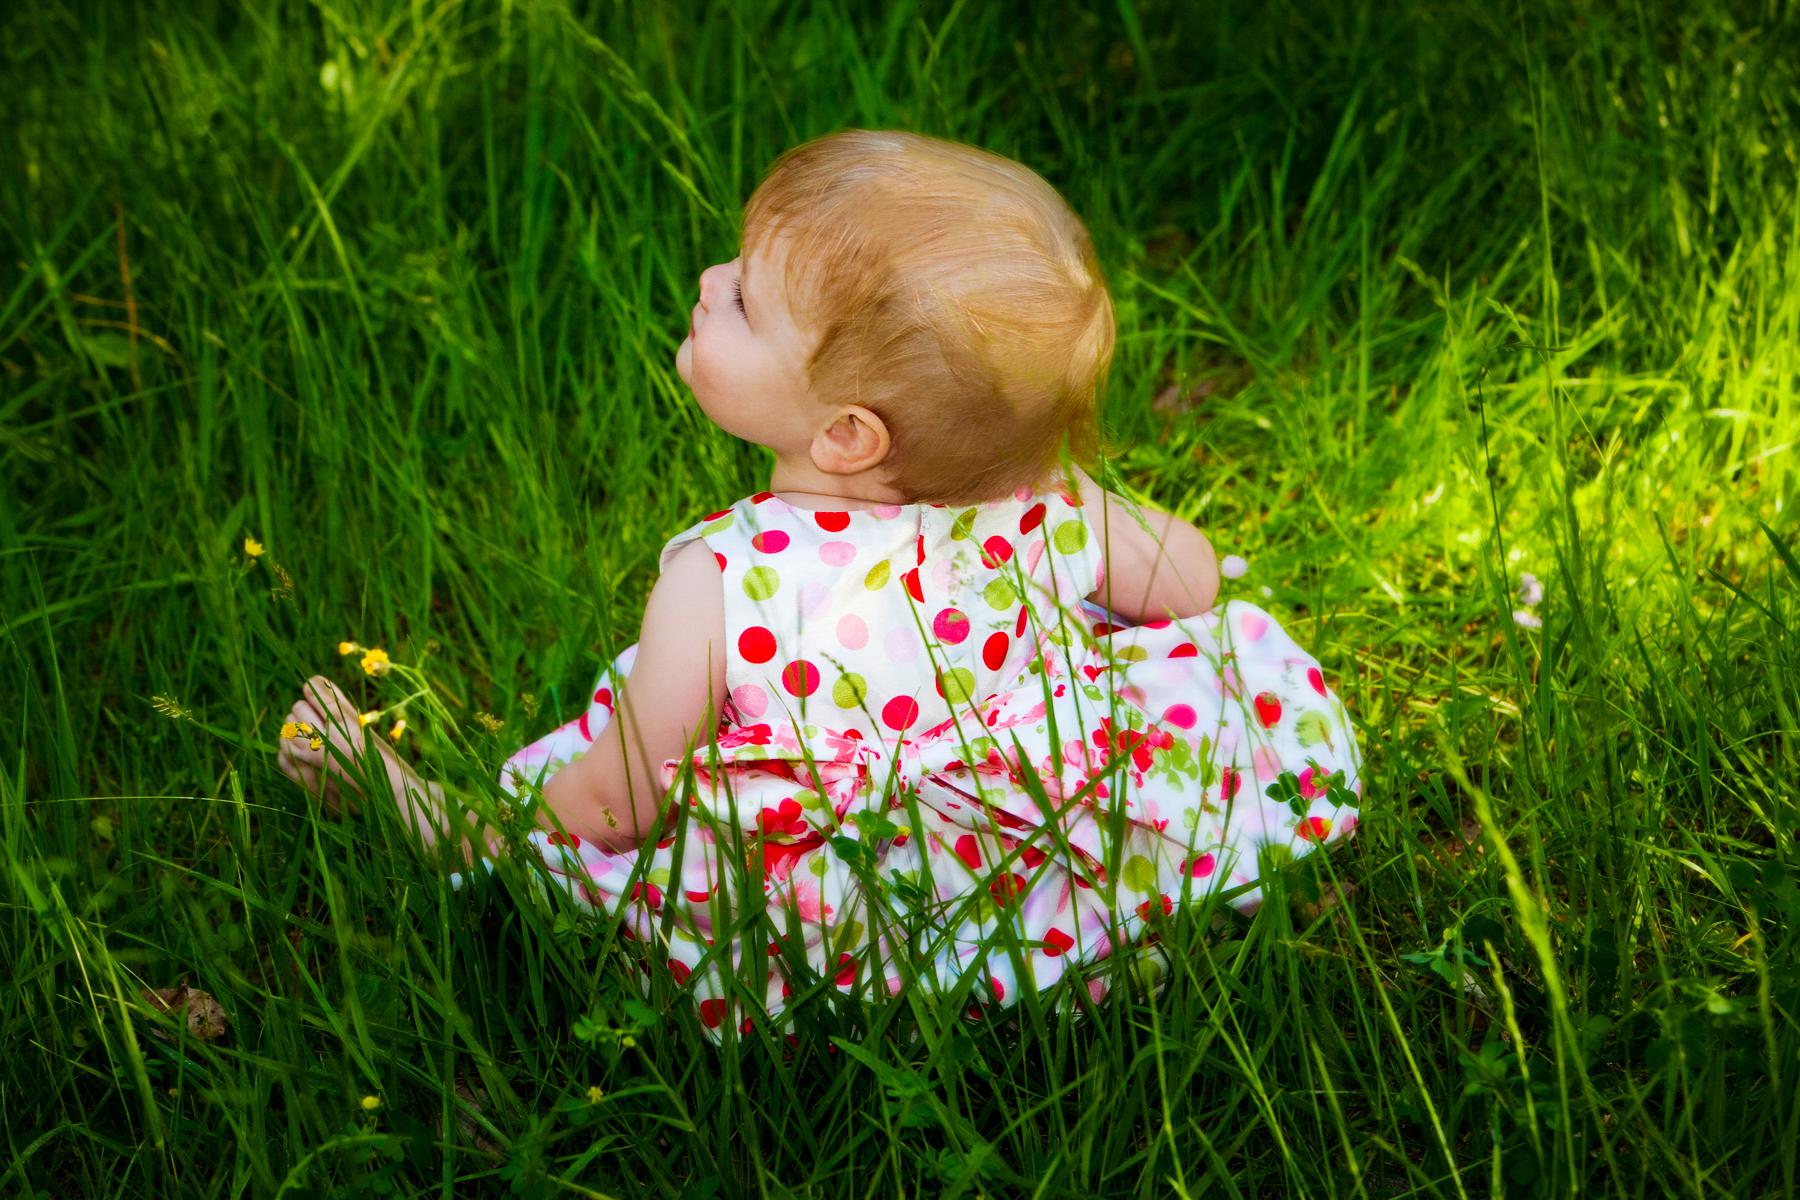 Children_001.jpg